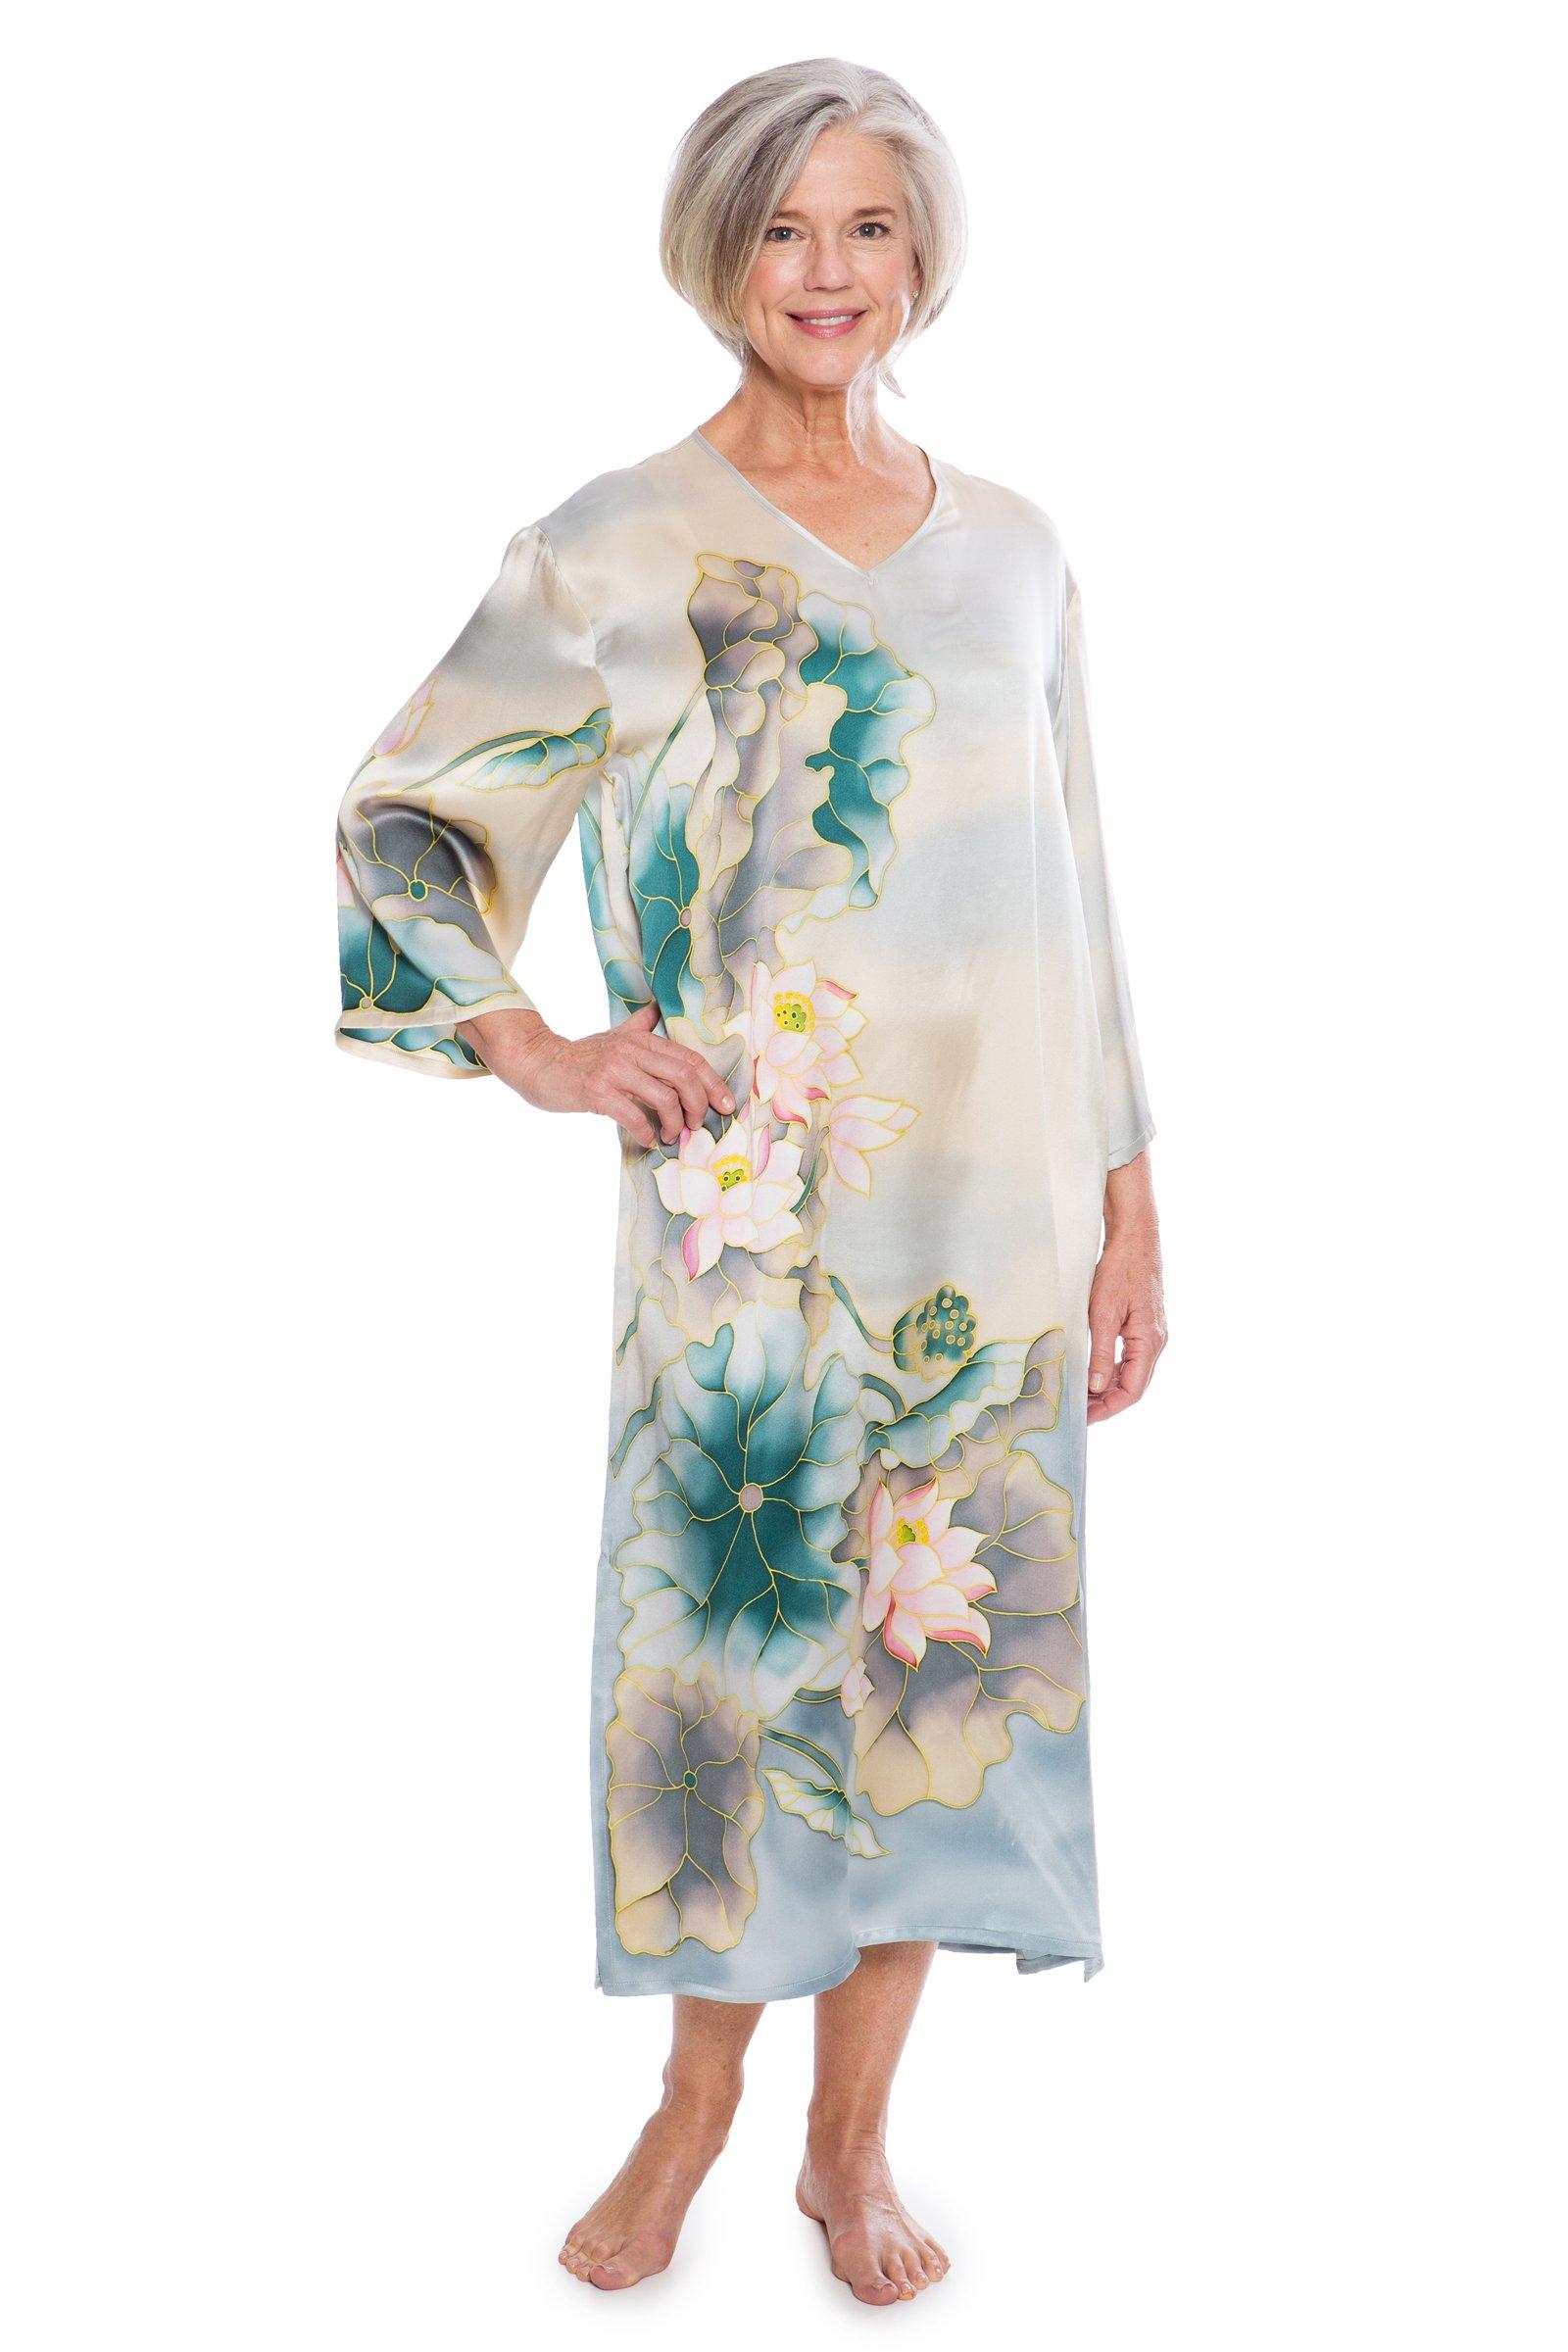 TexereSilk Women's Luxury 100% Silk Caftan - Beautiful Night Gown by (Lotusilk, Lake, Large) Elegant Long Sleepwear Present For Her TS-WS042-002-LAKE-R-L by TexereSilk (Image #1)